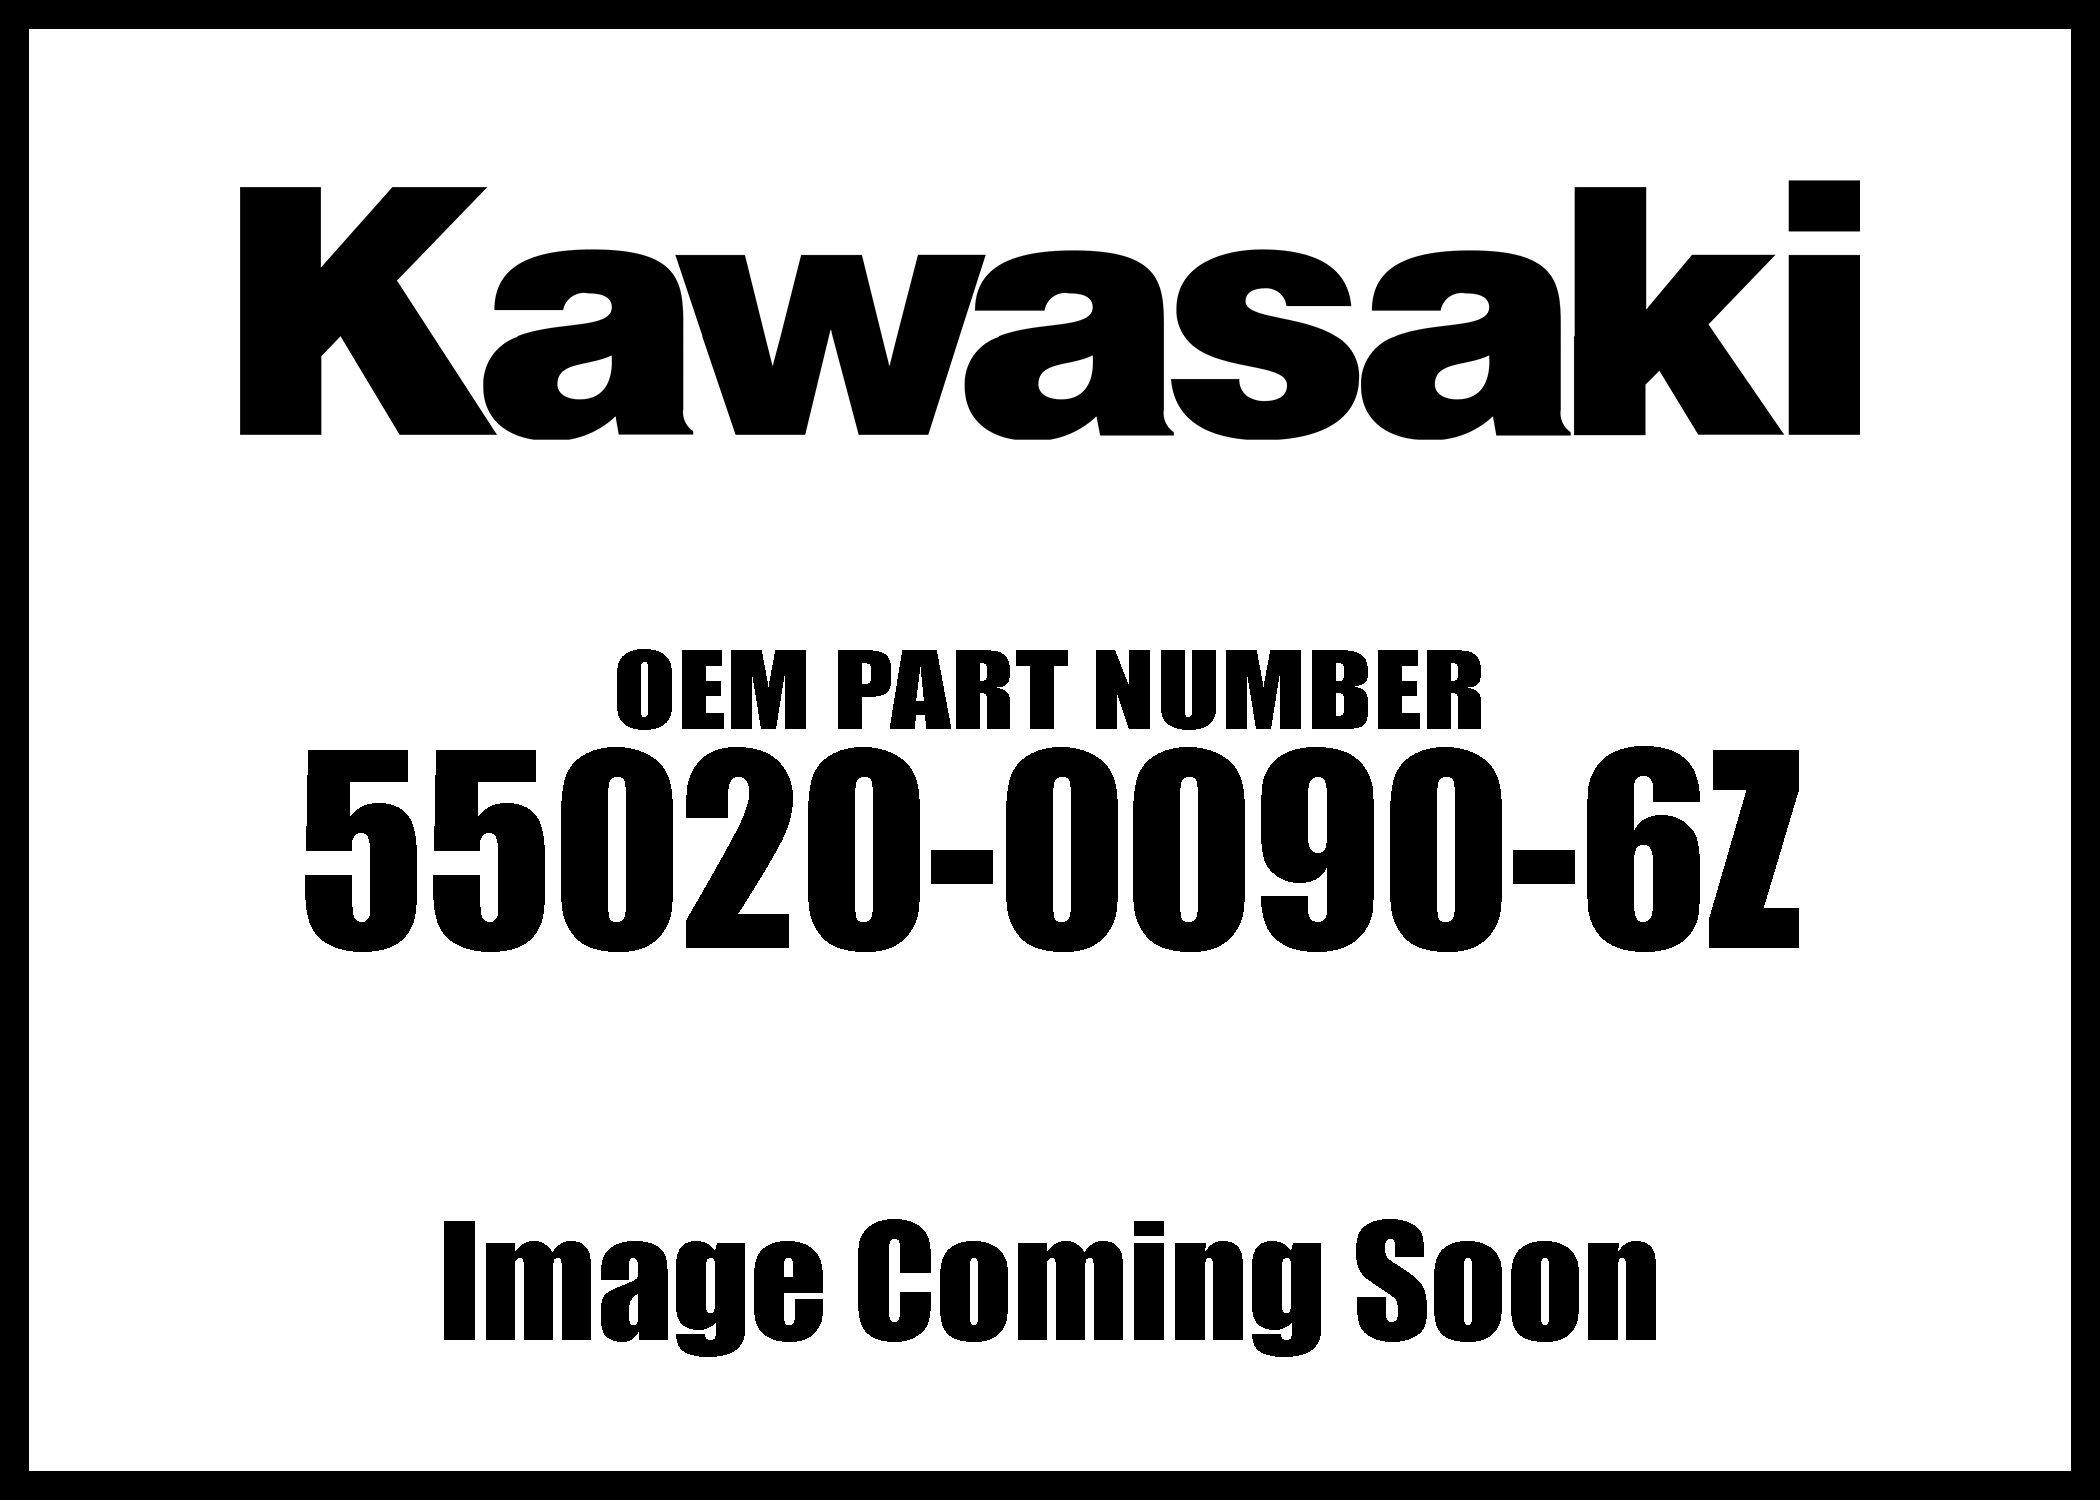 Kawasaki 2005-2016 Mule 600 Mule 610 4X4 Xc Realtree Apg Hd F Front Bumper Guard 55020-0090-6Z New Oem